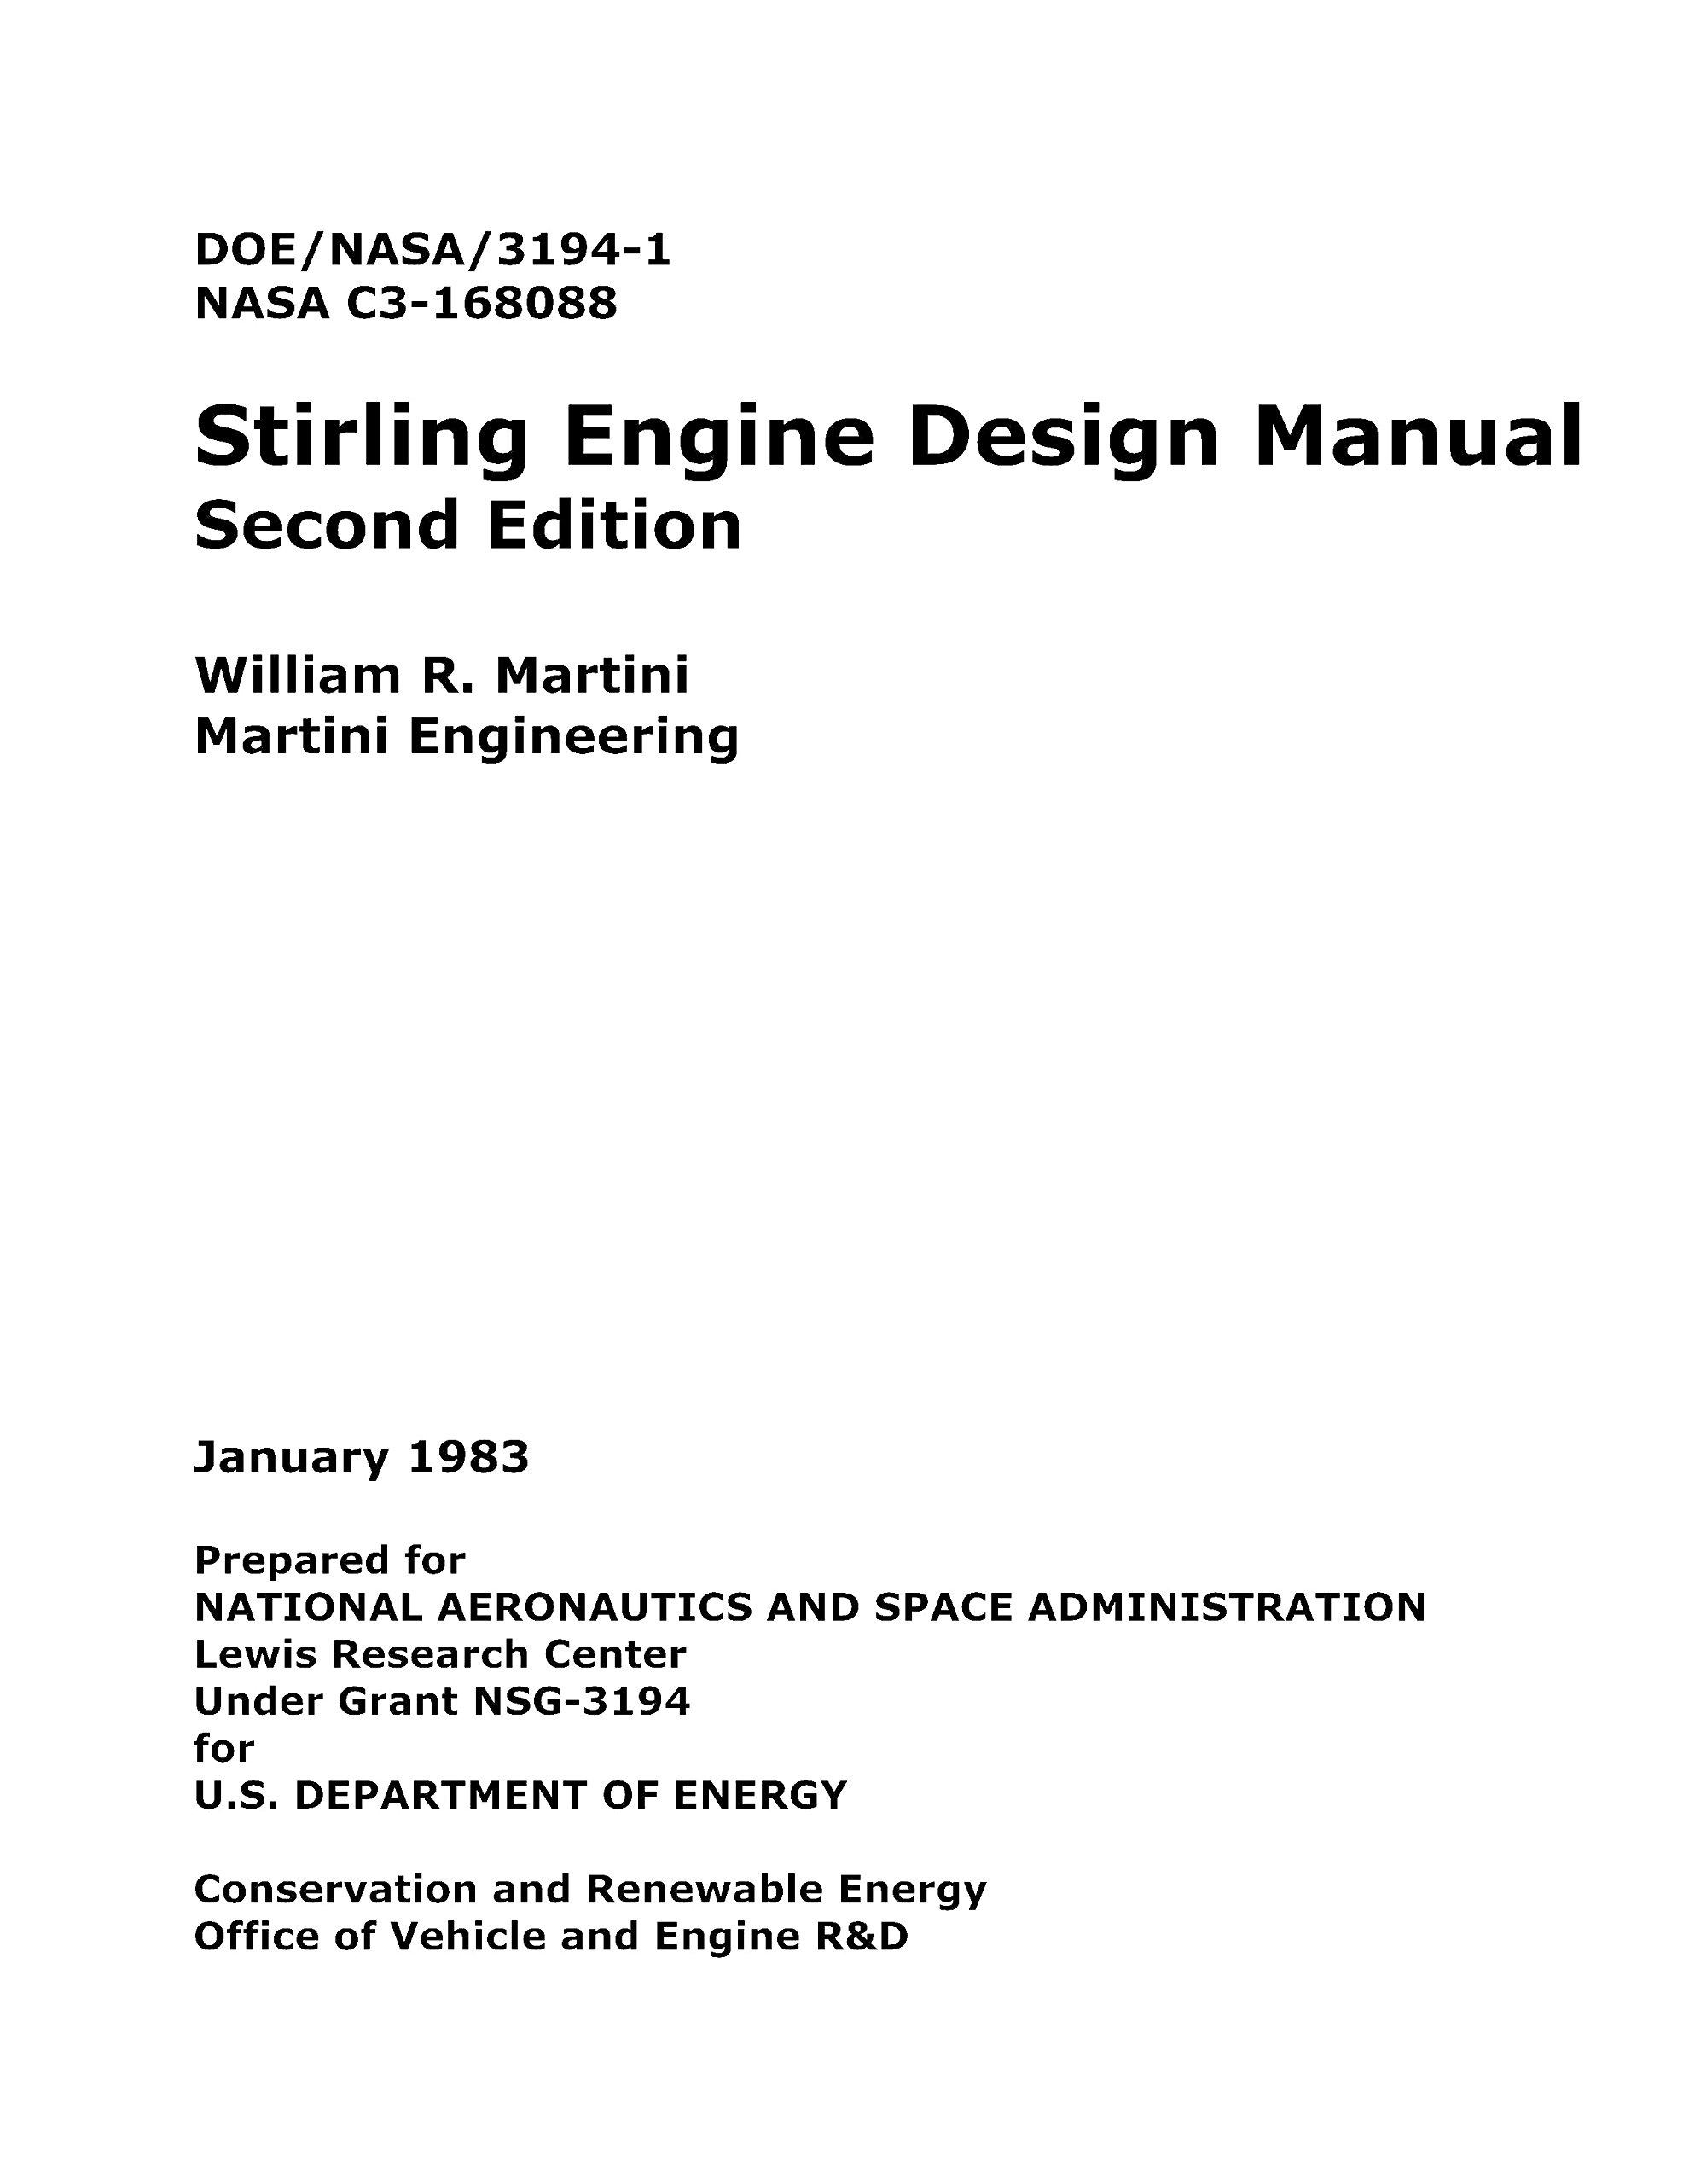 Stirling Engine Design Manual Second Edition Doe Nasa 3194 1 C3 Diagram 168088 Enlarge 1983 William R Martini Books